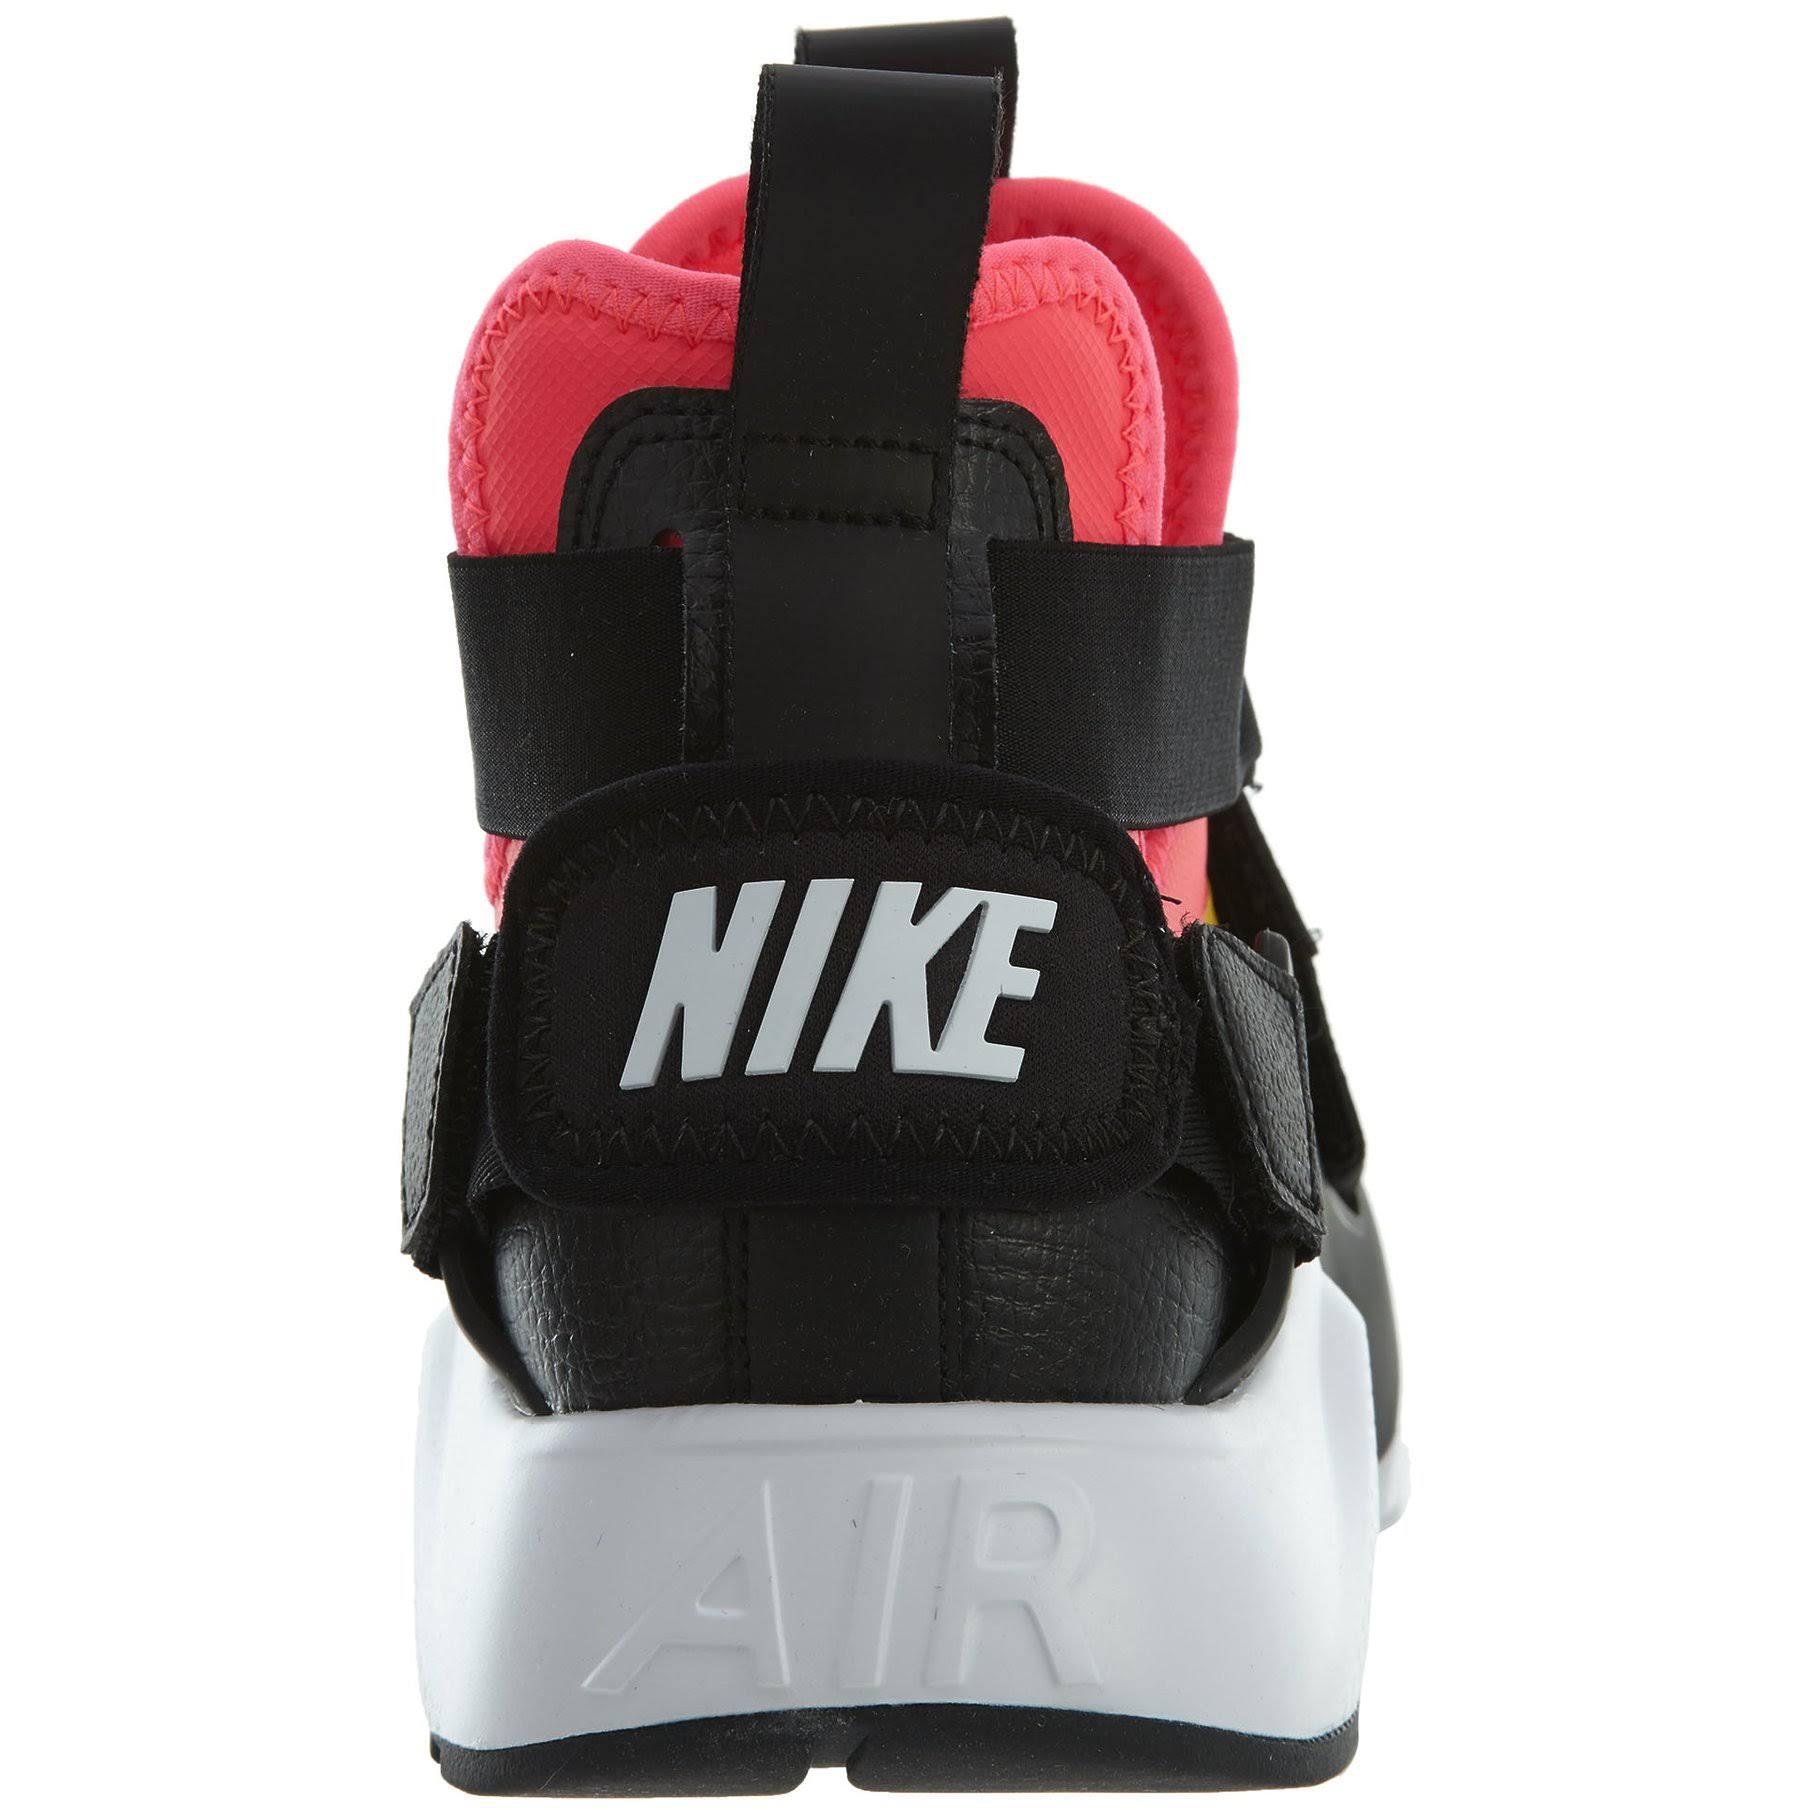 multicolore Huarache donna CityScarpe da Aqua 6 Air taglia Bleached Nike bEIYWD9eH2